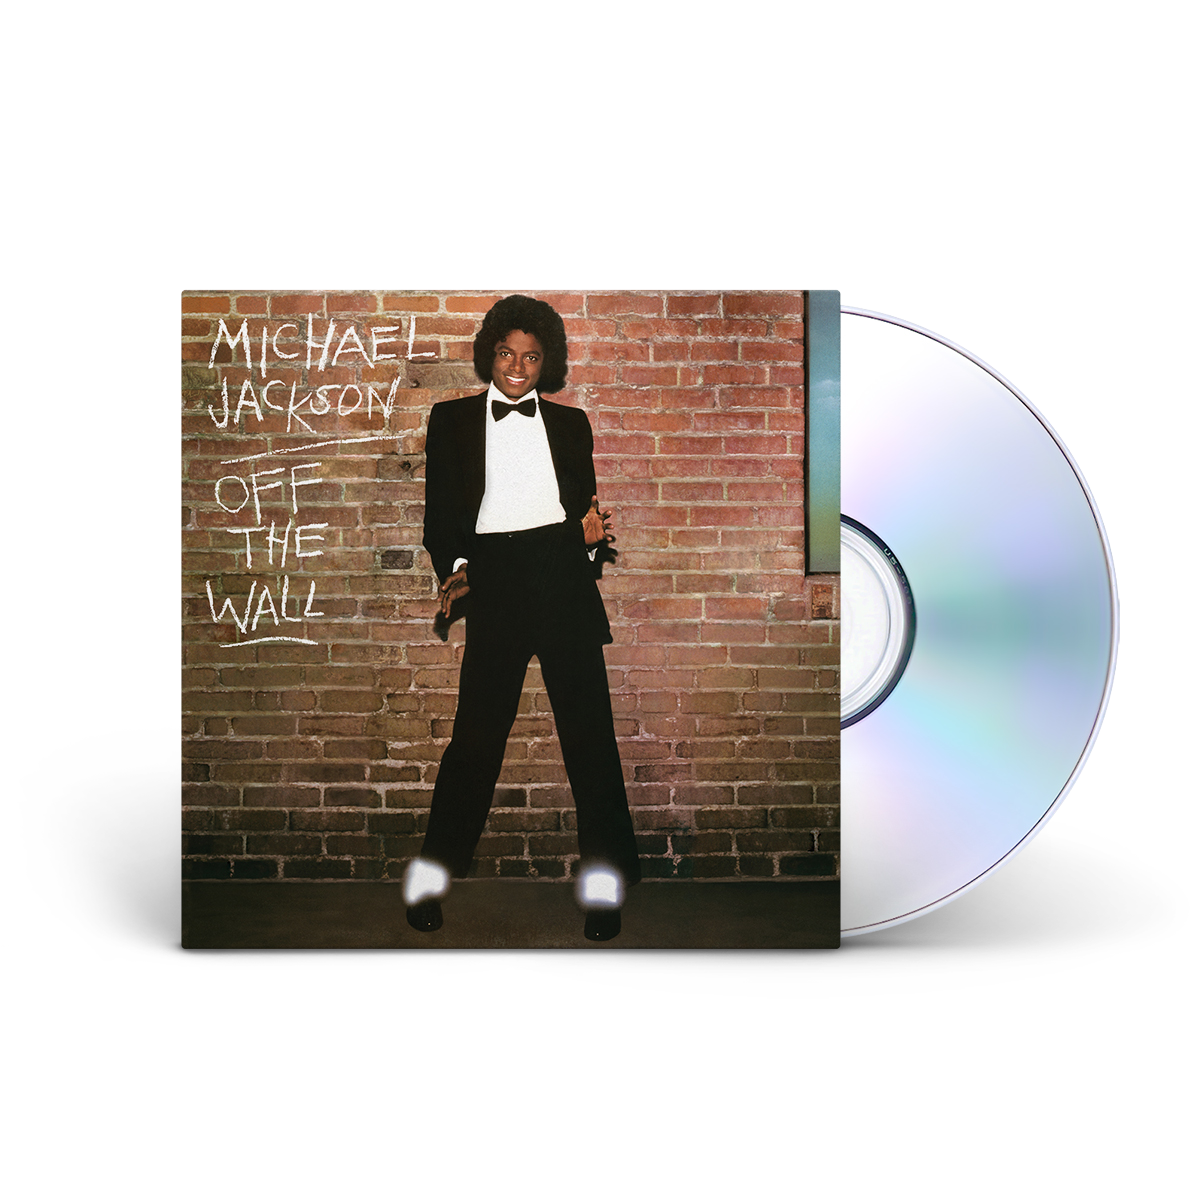 Off The Wall (CD/Blu-Ray) CD